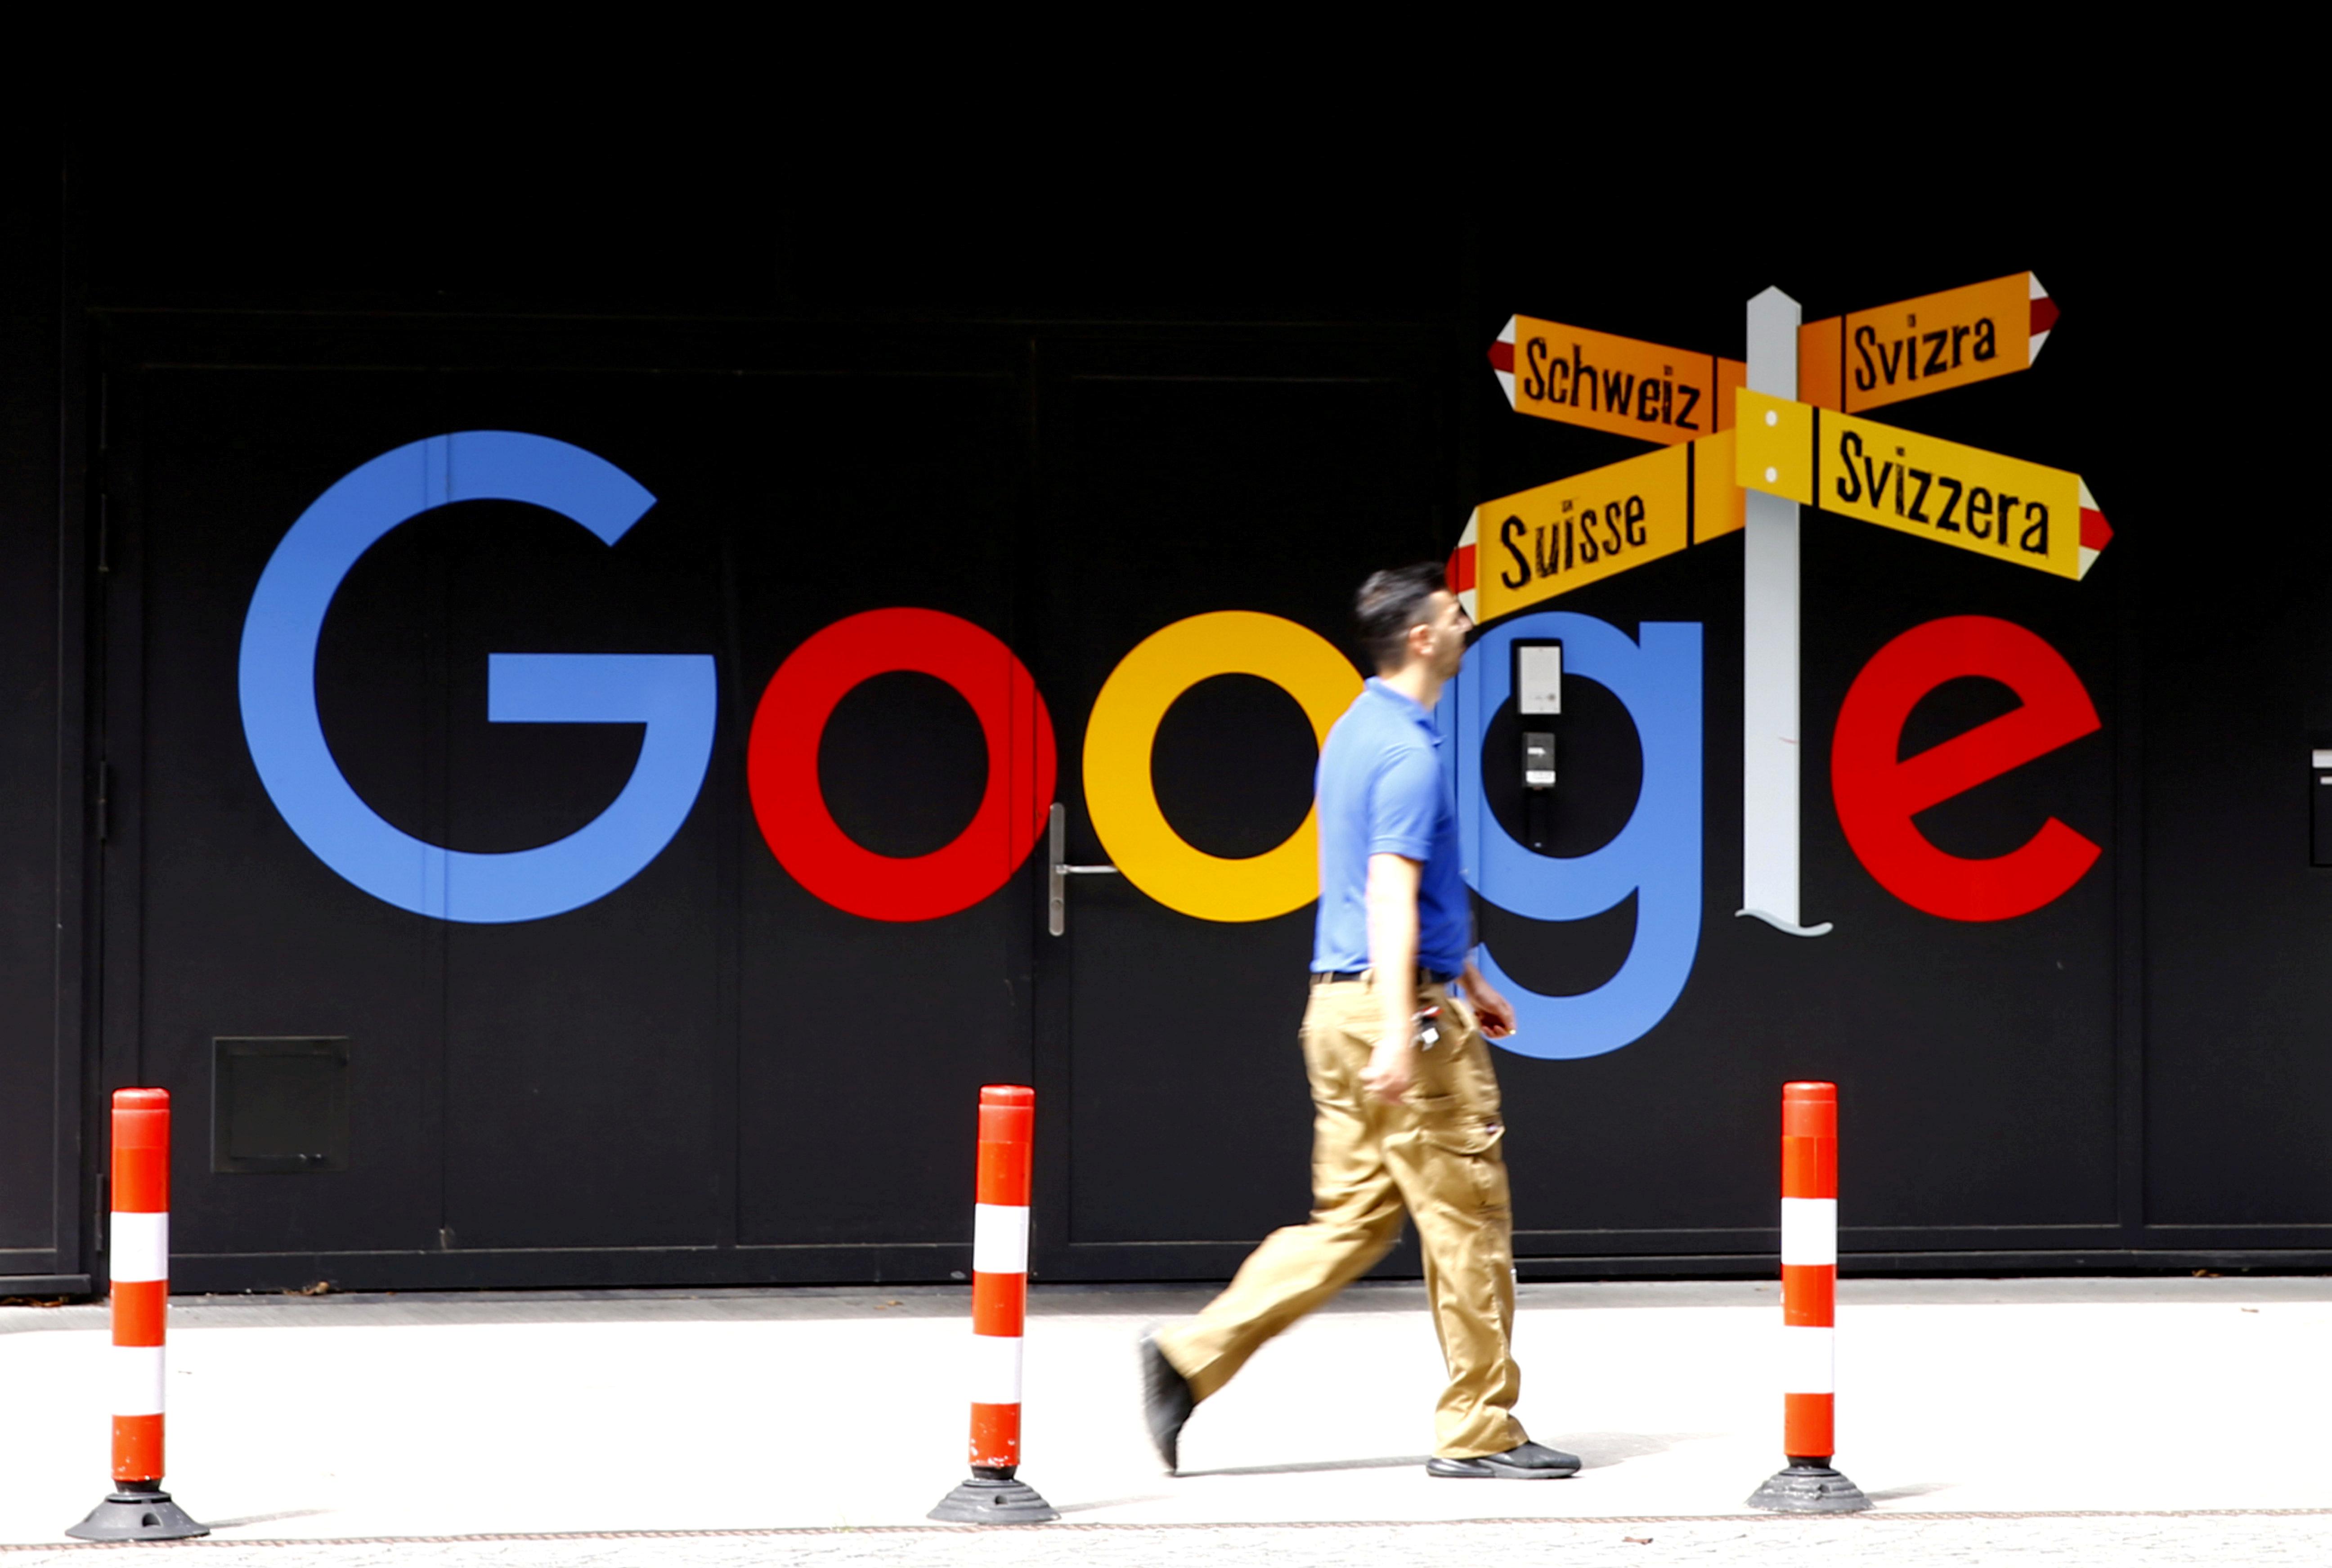 A man walks past a logo of Google in front of at an office building in Zurich, Switzerland July 1, 2020.   REUTERS/Arnd Wiegmann